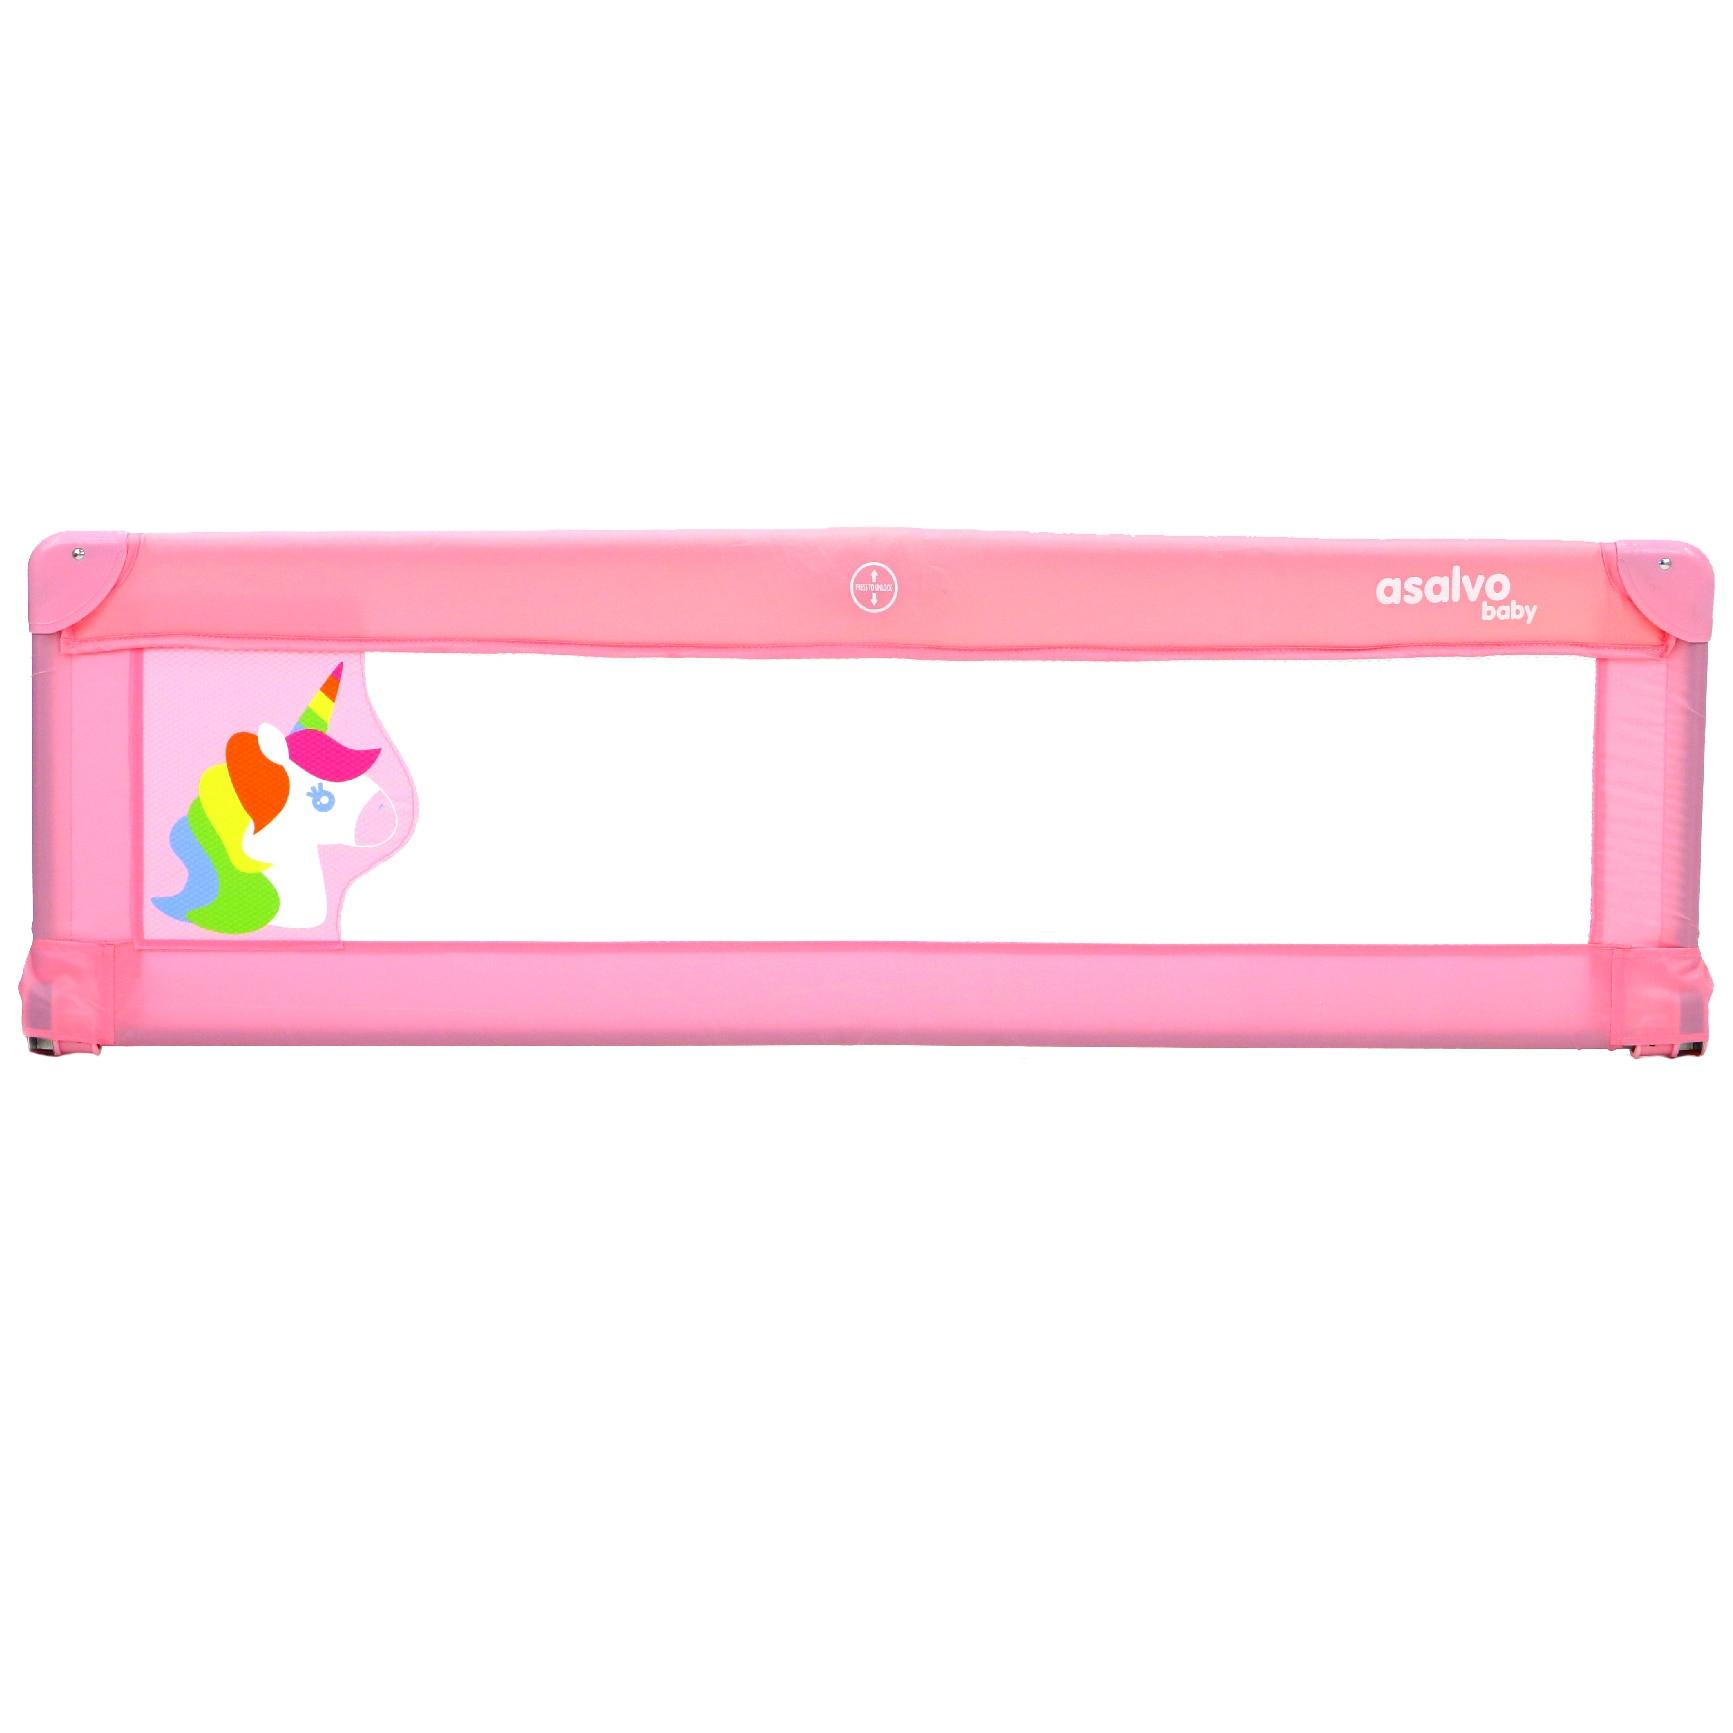 Fotografie Bariera de protectie pat copii Asalvo Unicorn, 140 x 43.5 cm, Roz